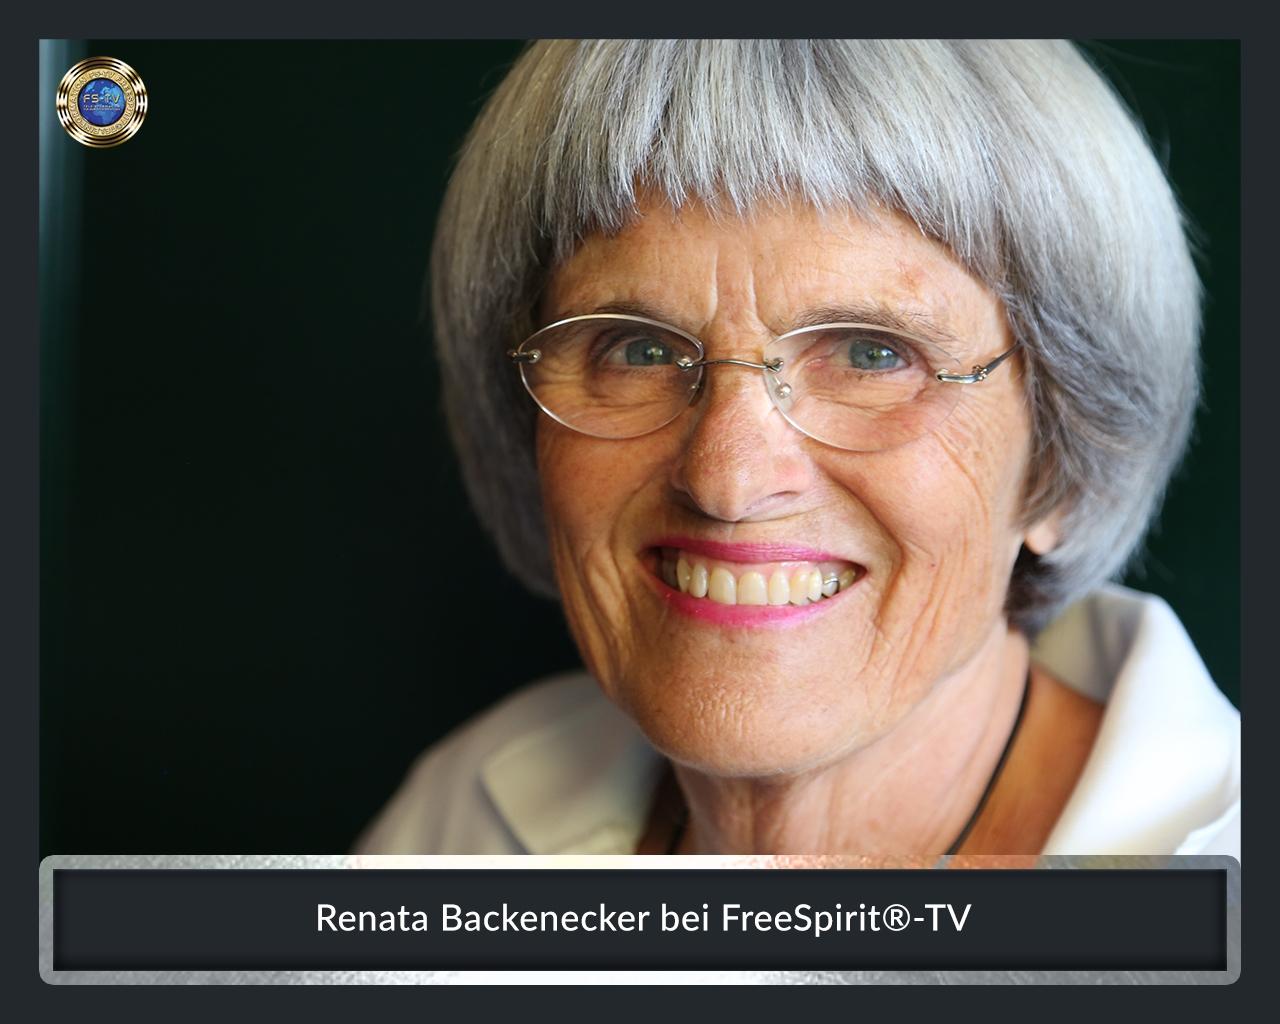 FS-TV-Bildergallerie-Renata-Backenecker-4